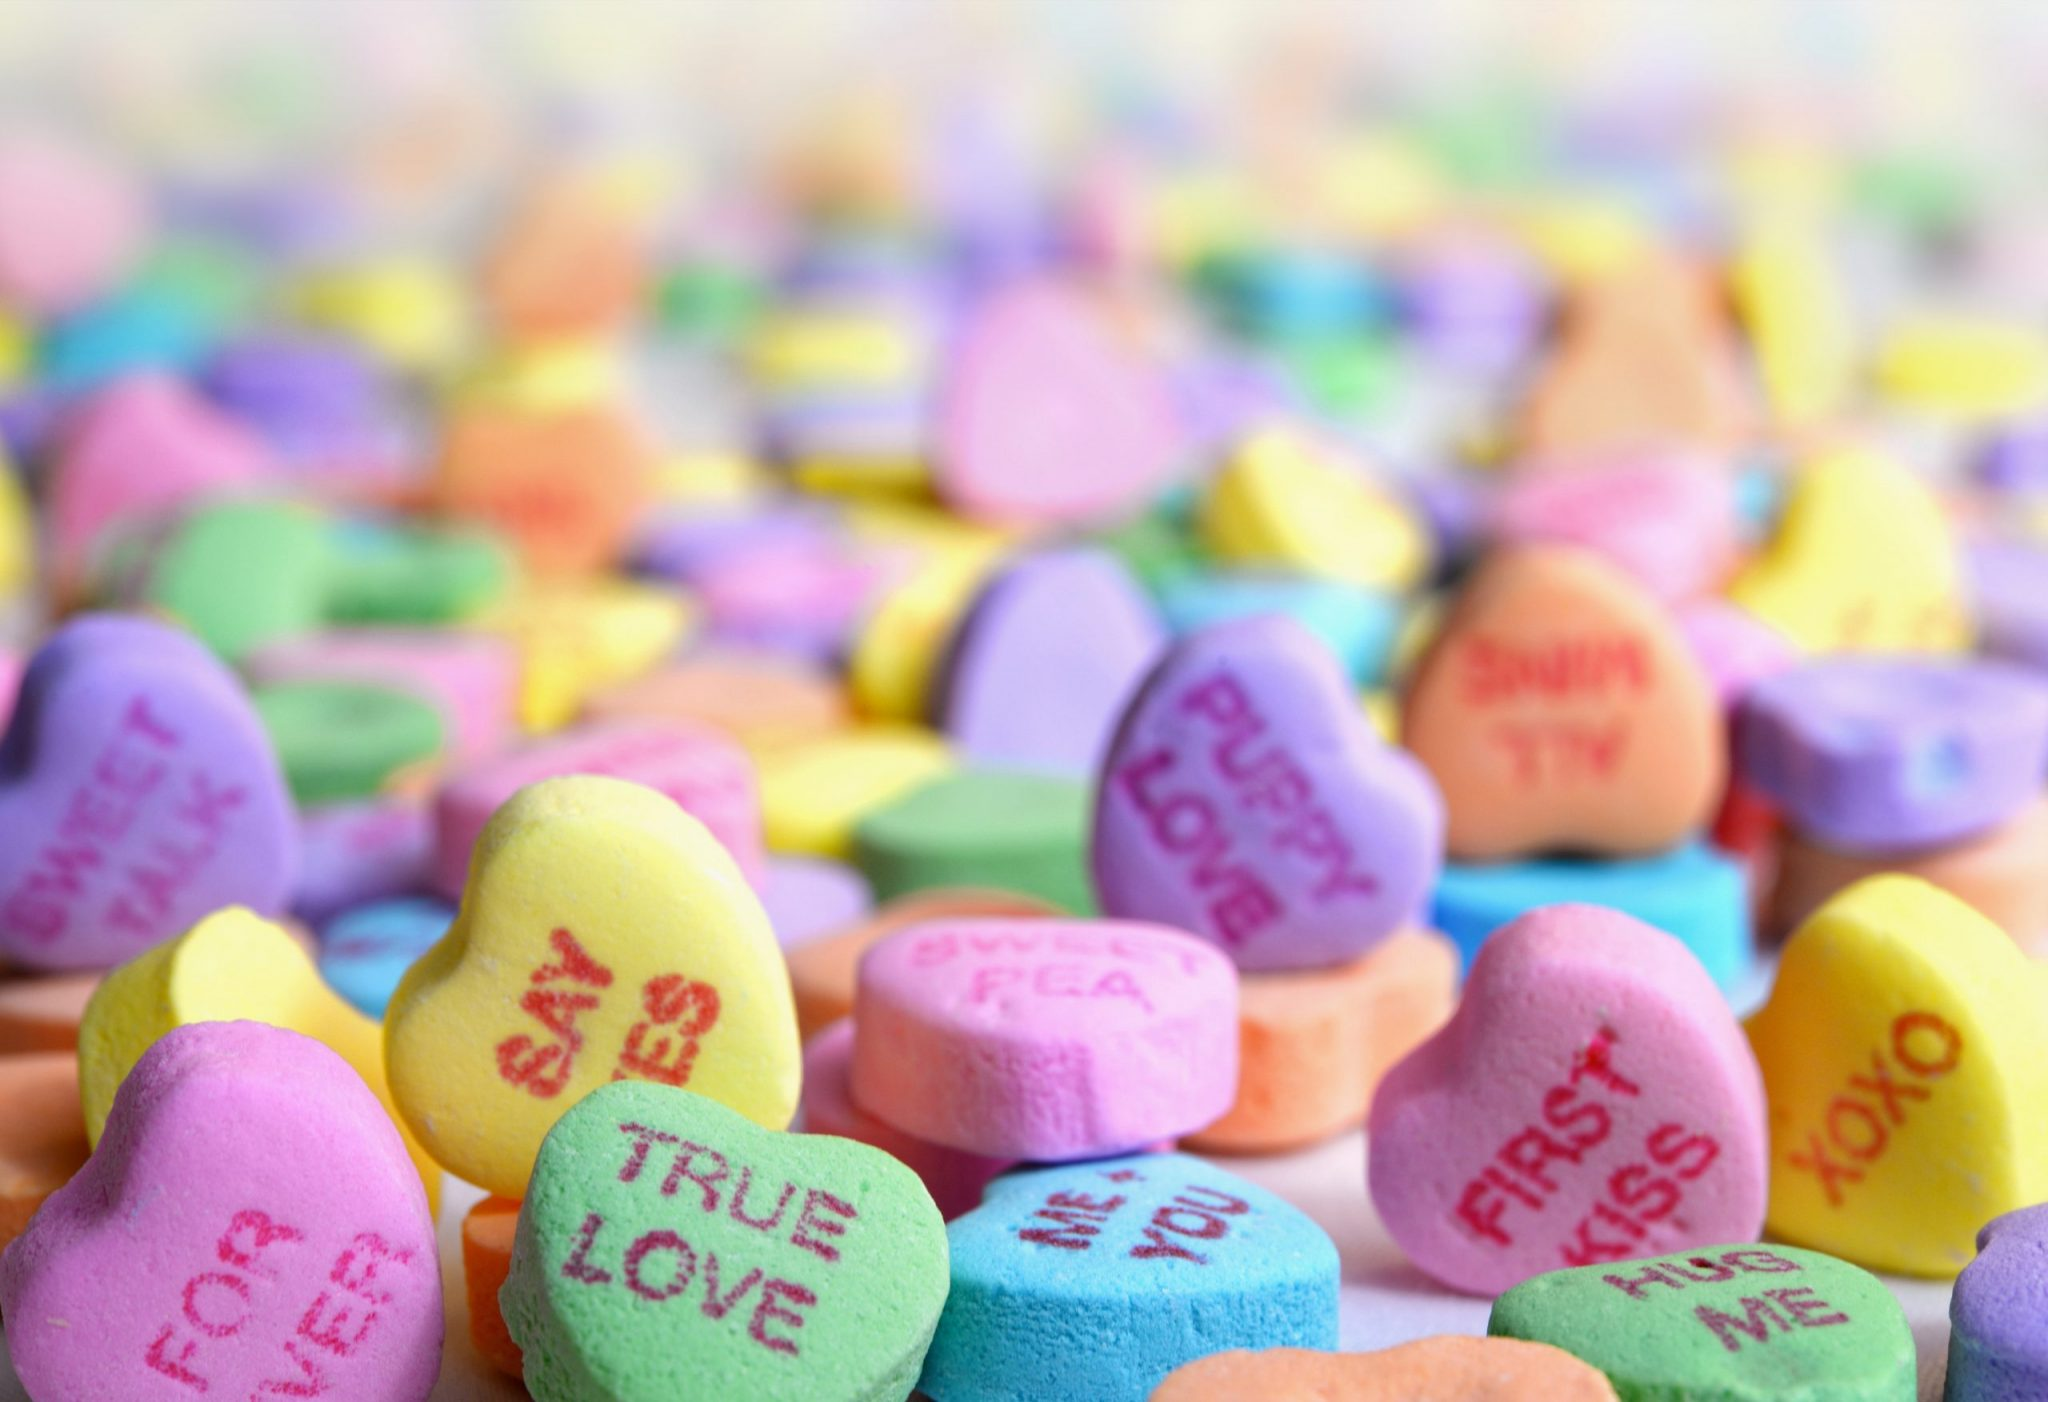 Valentine's Day Gift Guide, Sugar & Spice